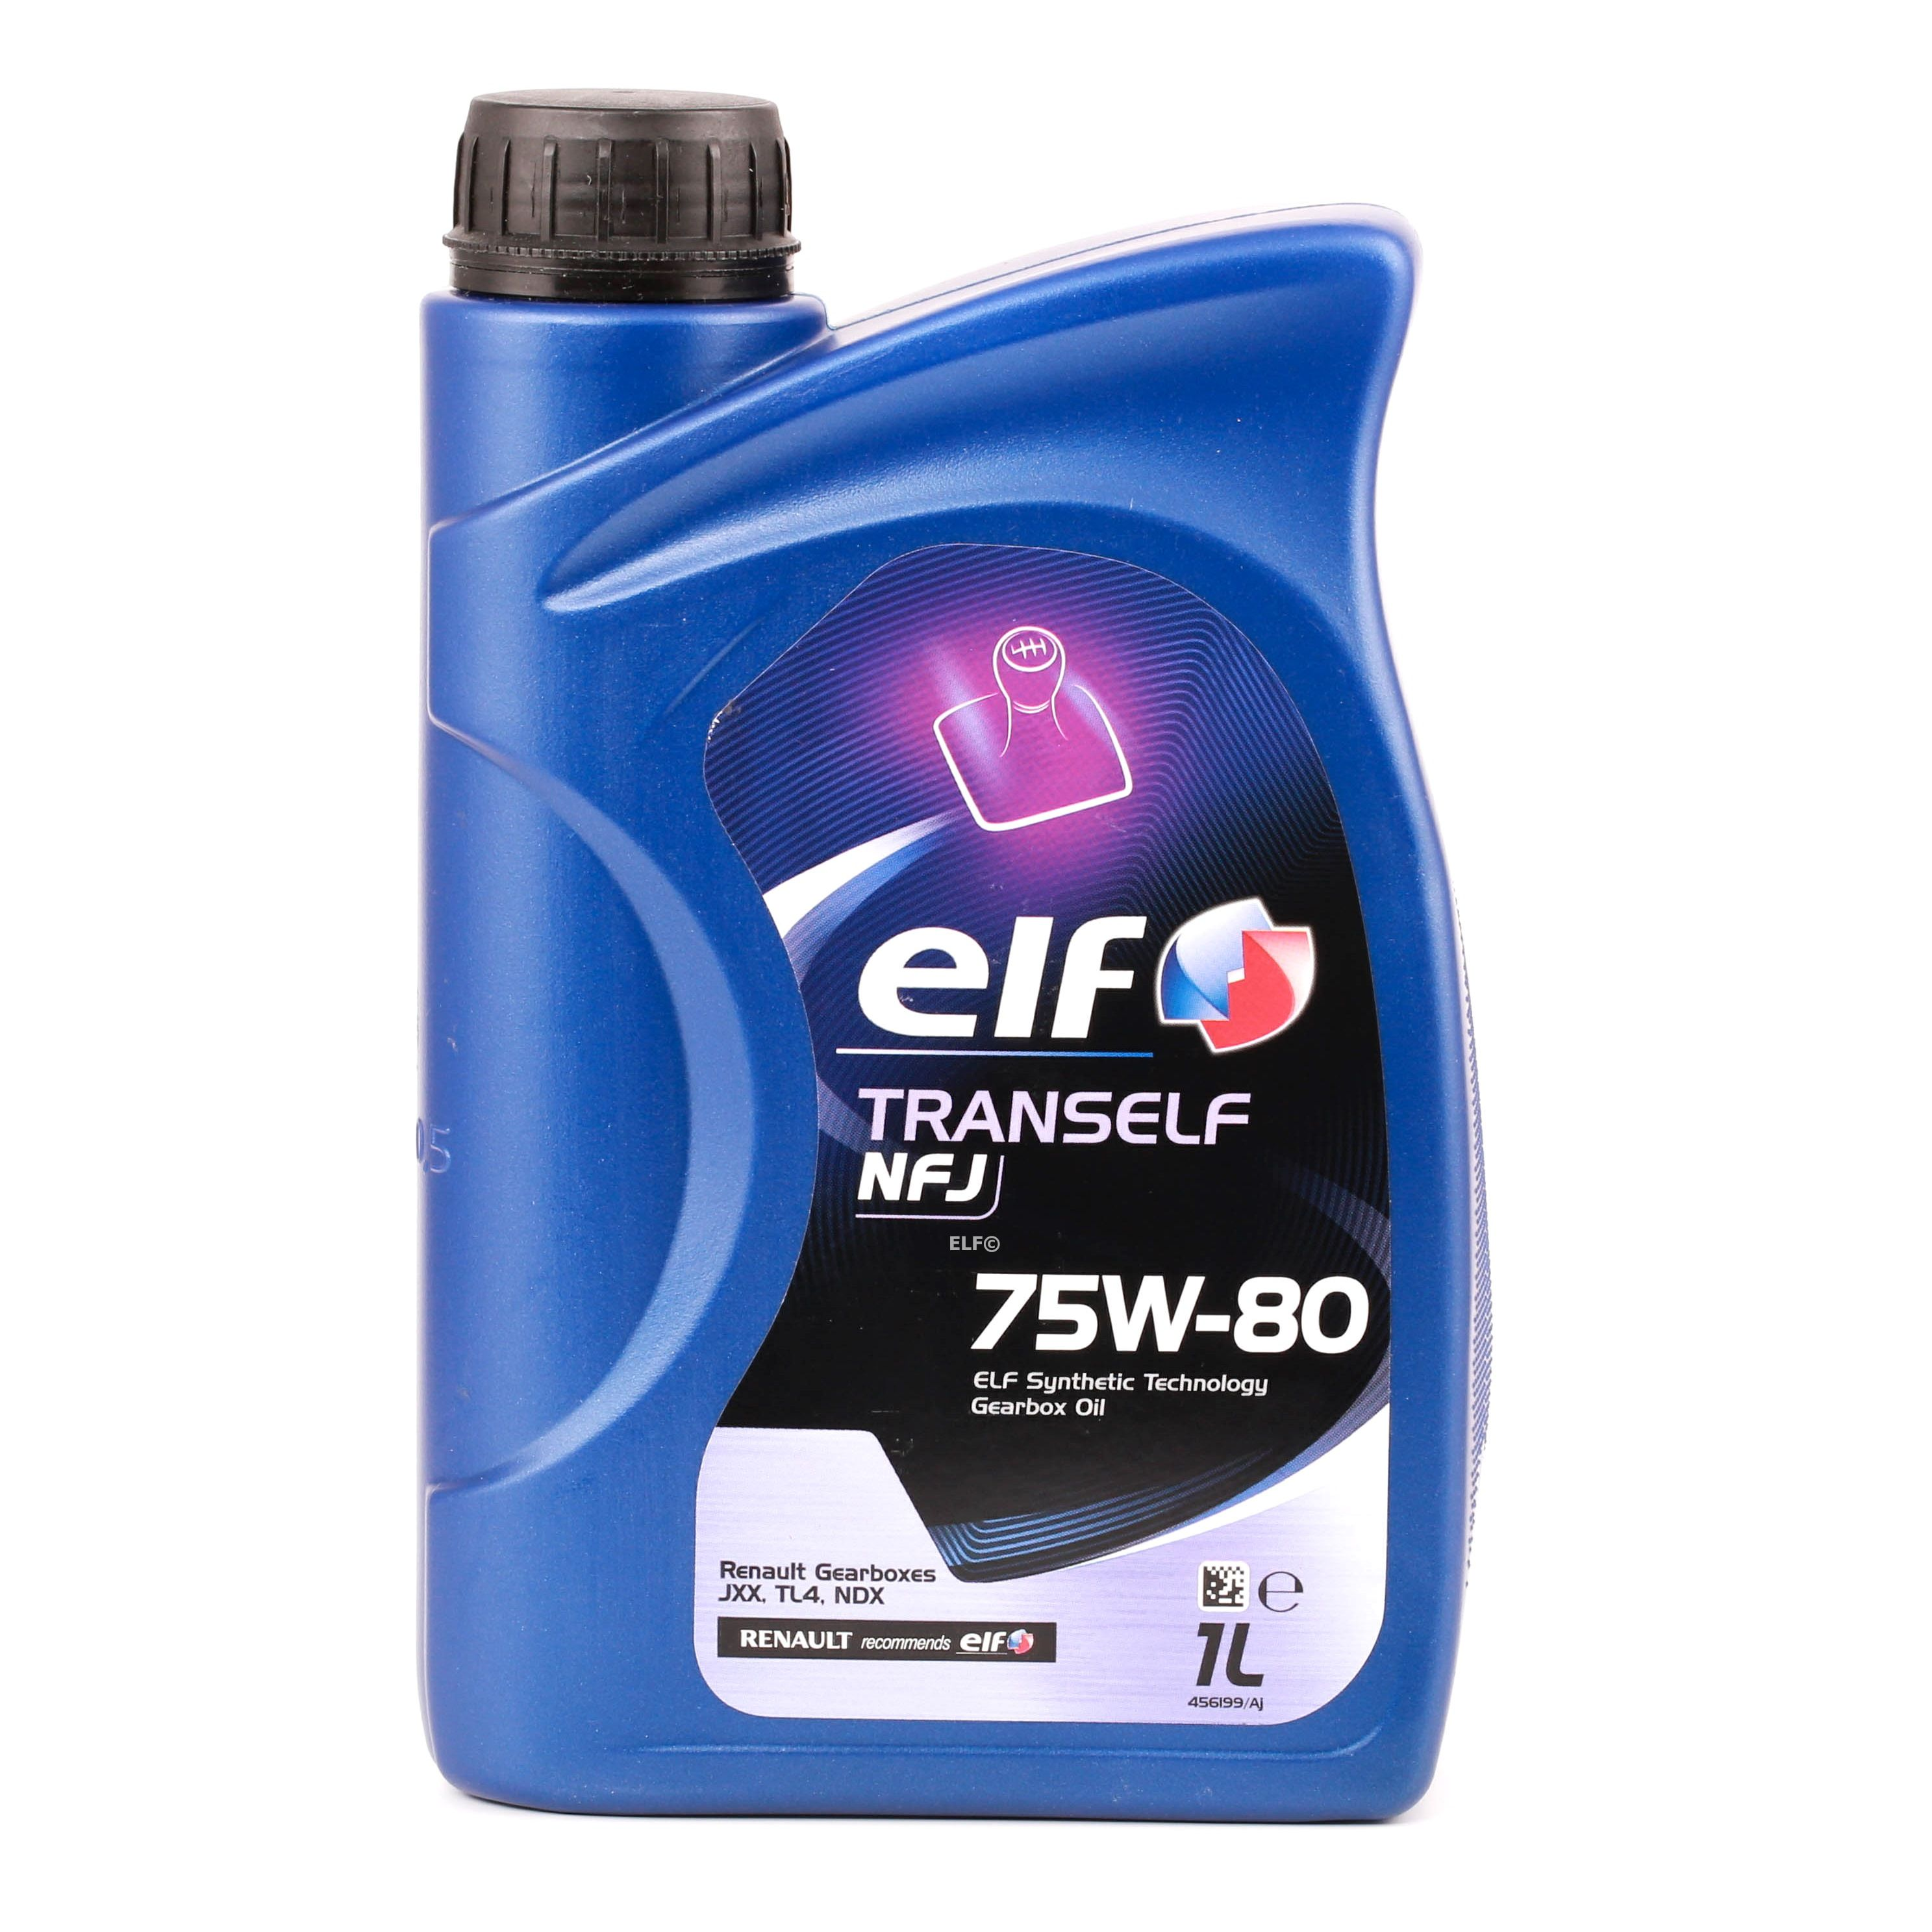 0501CA5005C7467307 ELF NFJ, TRANS 75W-80, Capacity: 1l API GL-4 Transmission Oil 2194757 cheap